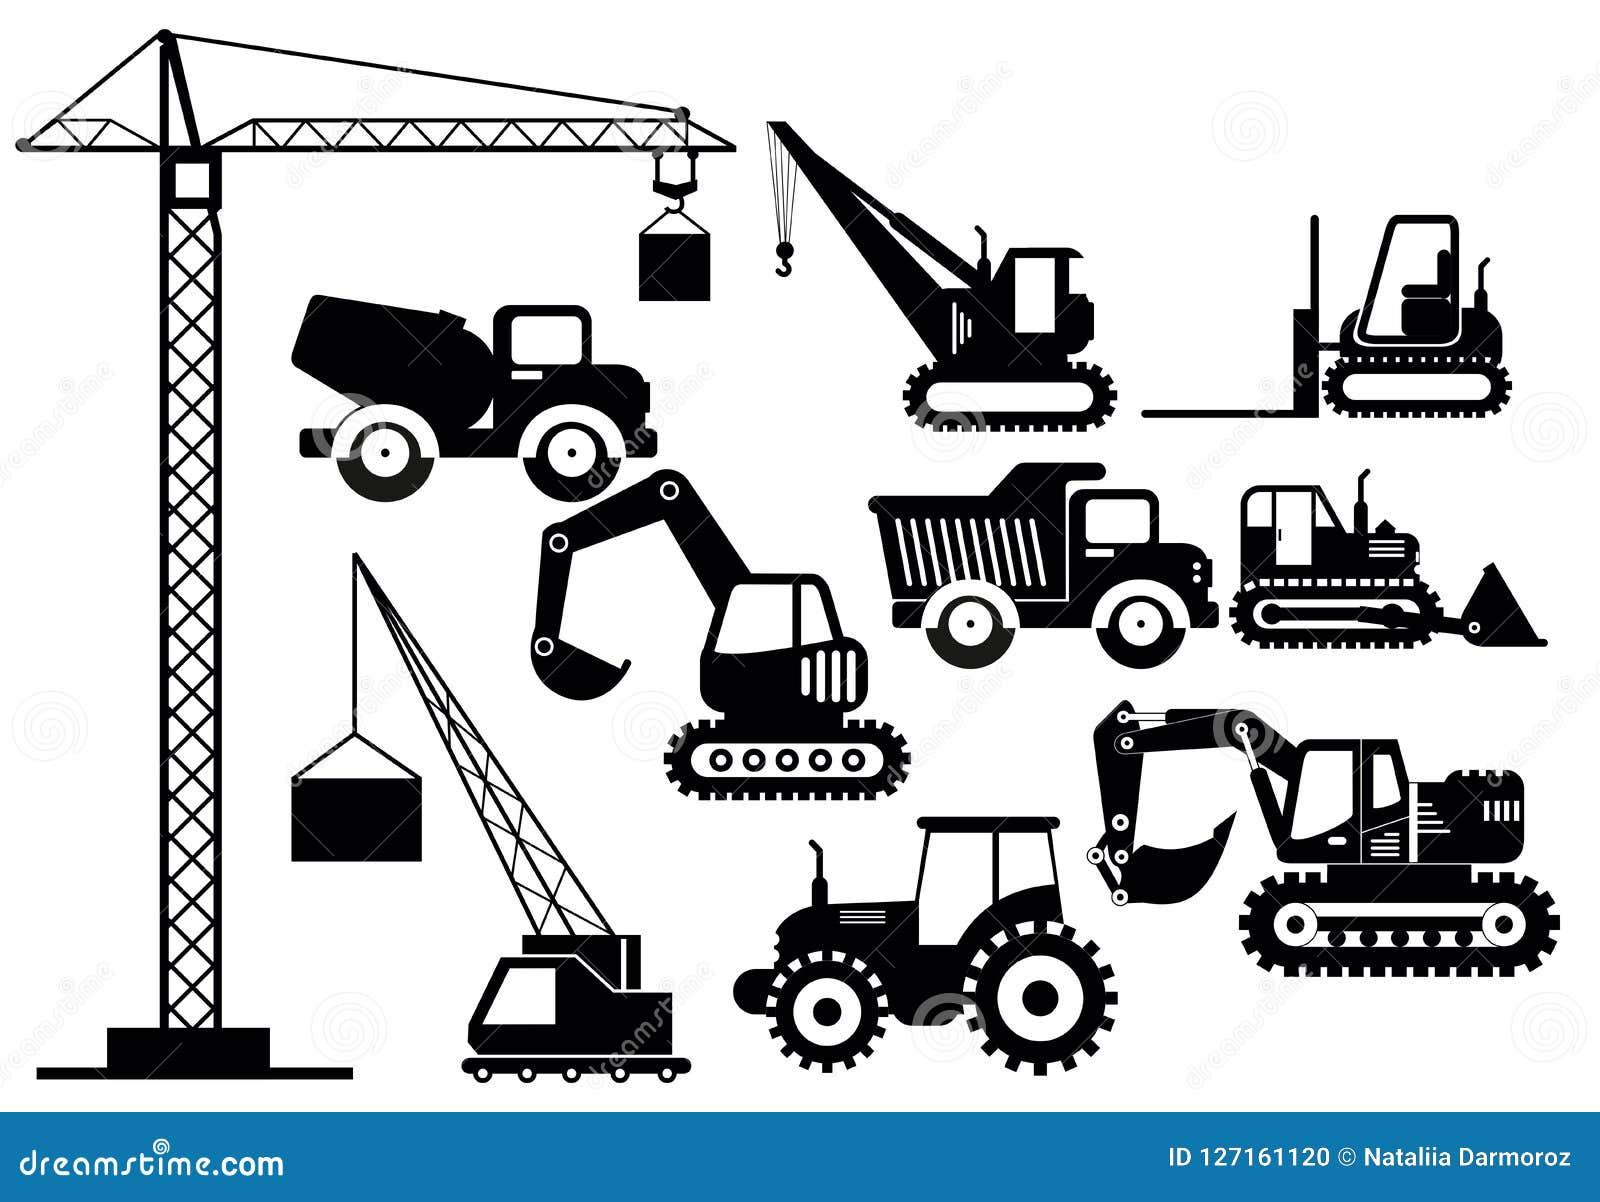 Vector Illustration Set Of Excavators And Heavy Construction